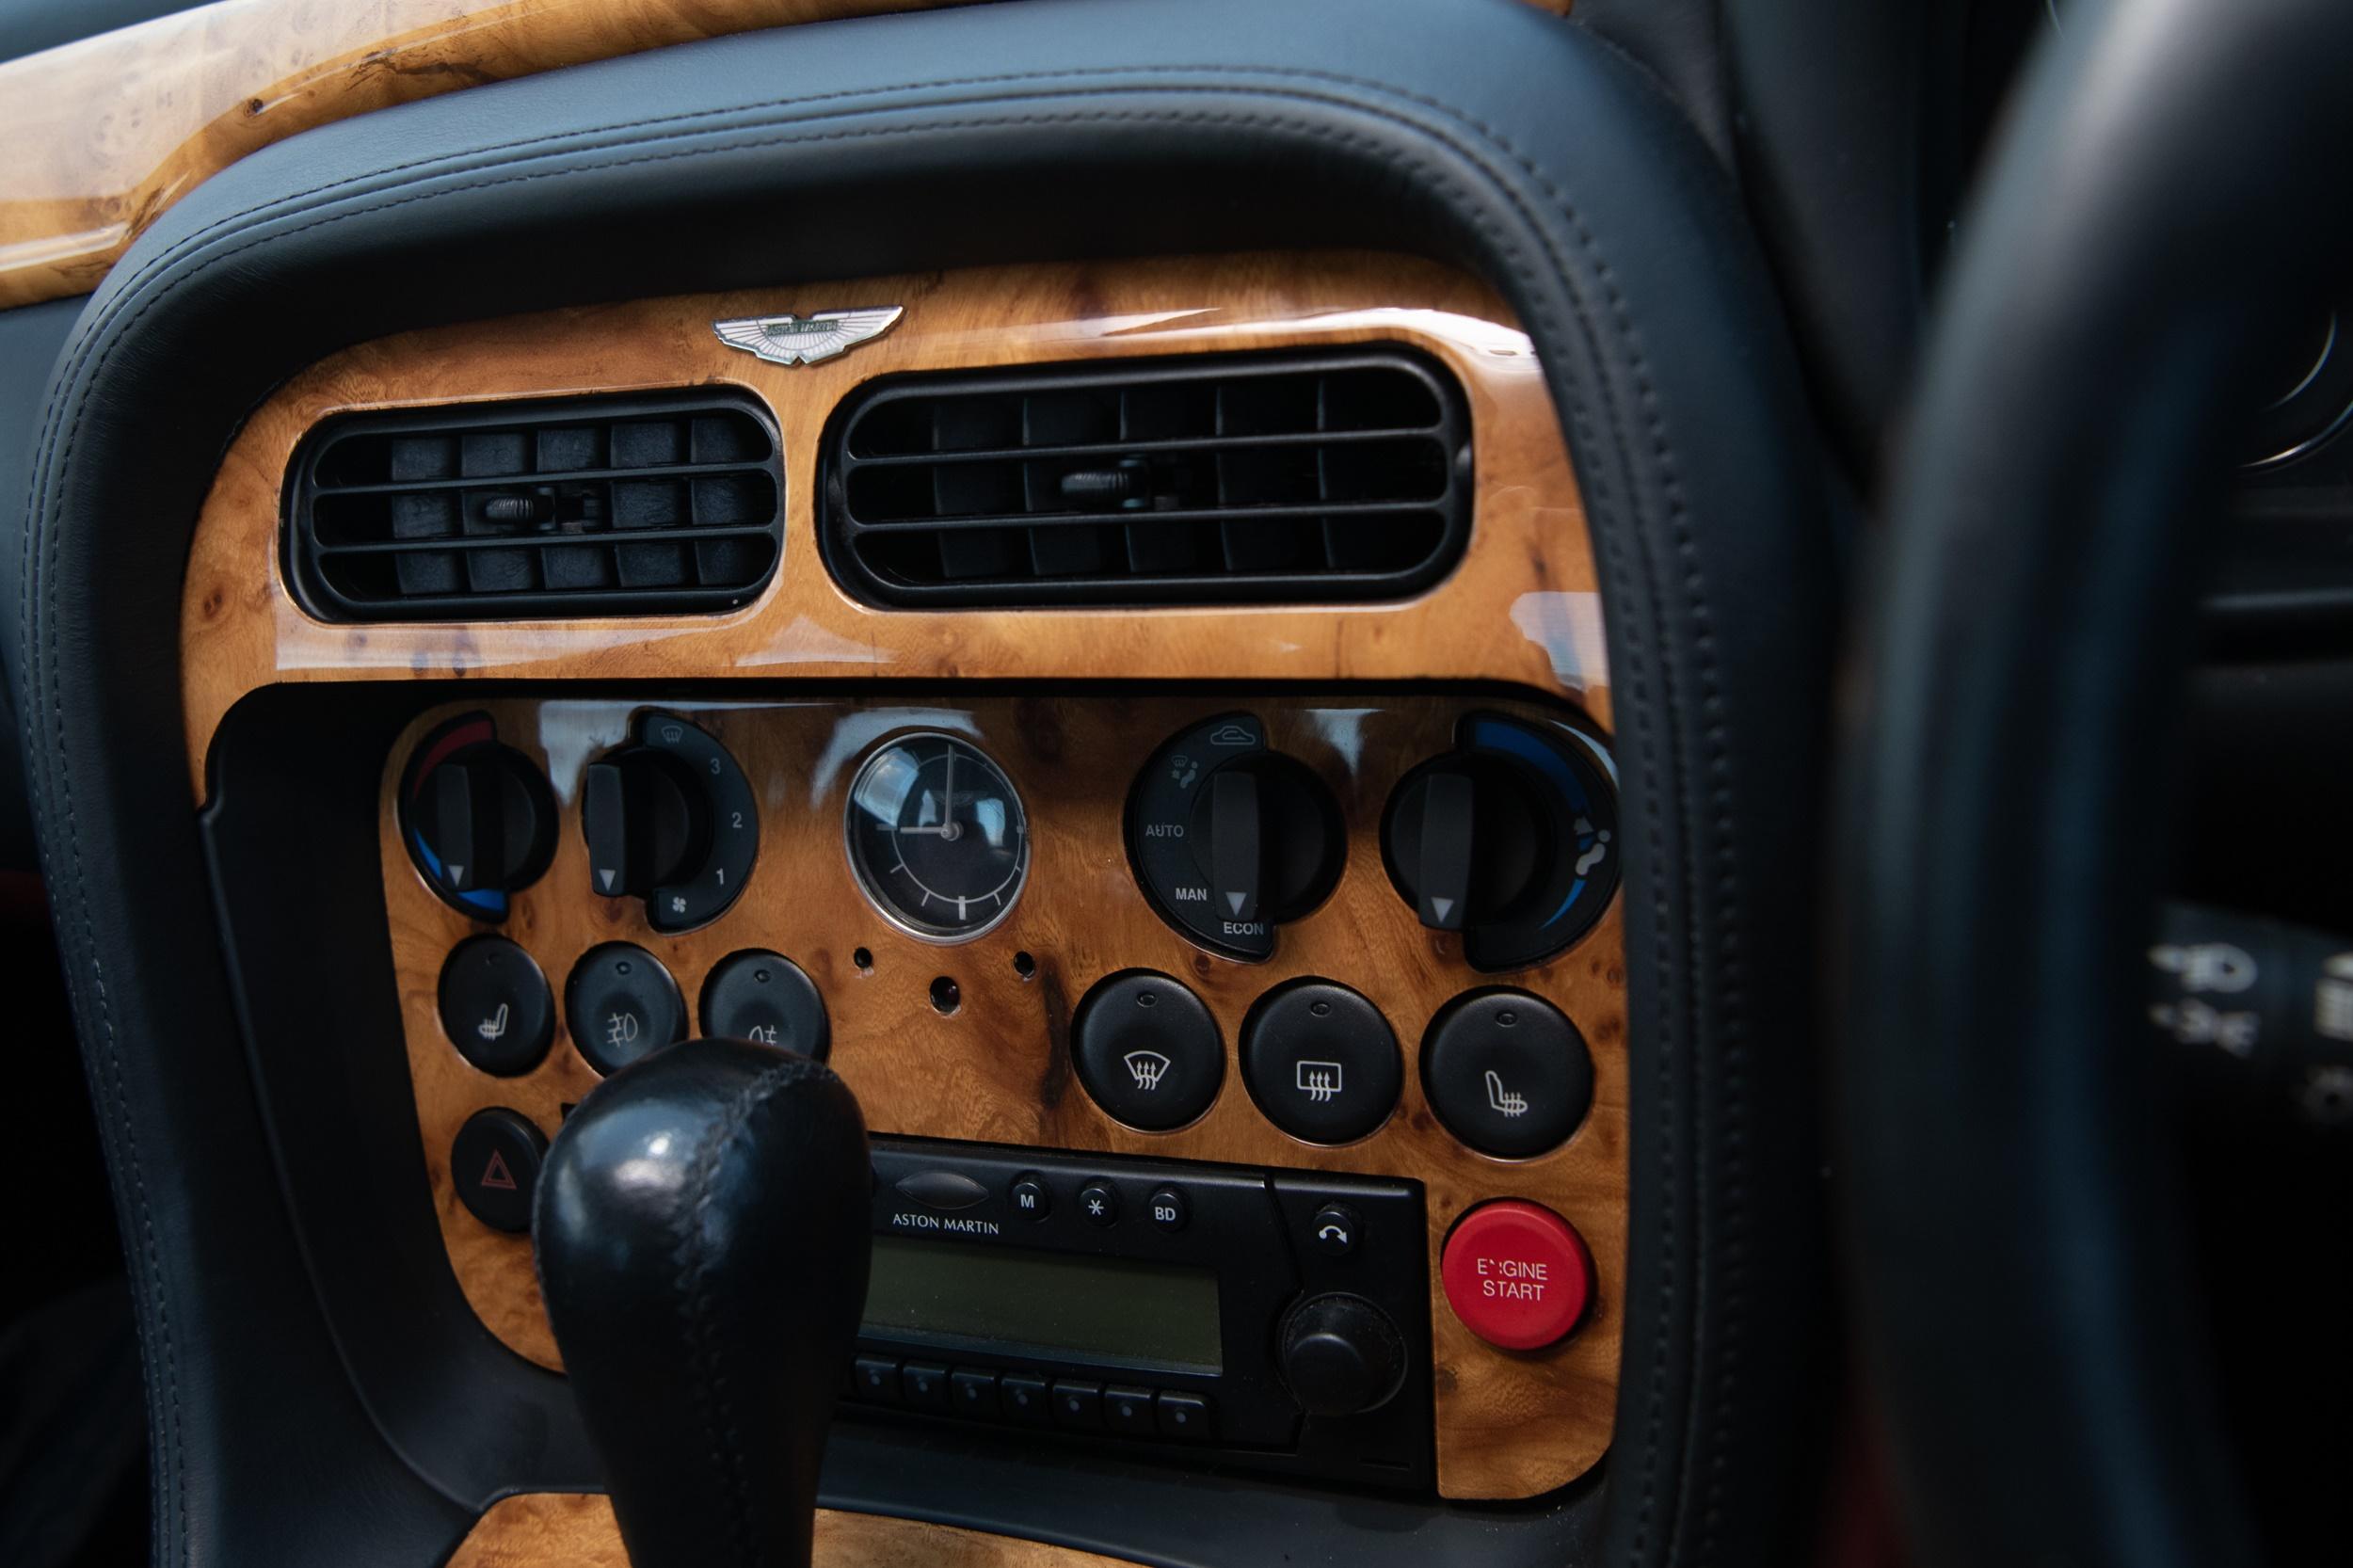 A 1995 ASTON MARTIN DB7 3.2 COUPE MOTOR CAR - Image 13 of 16